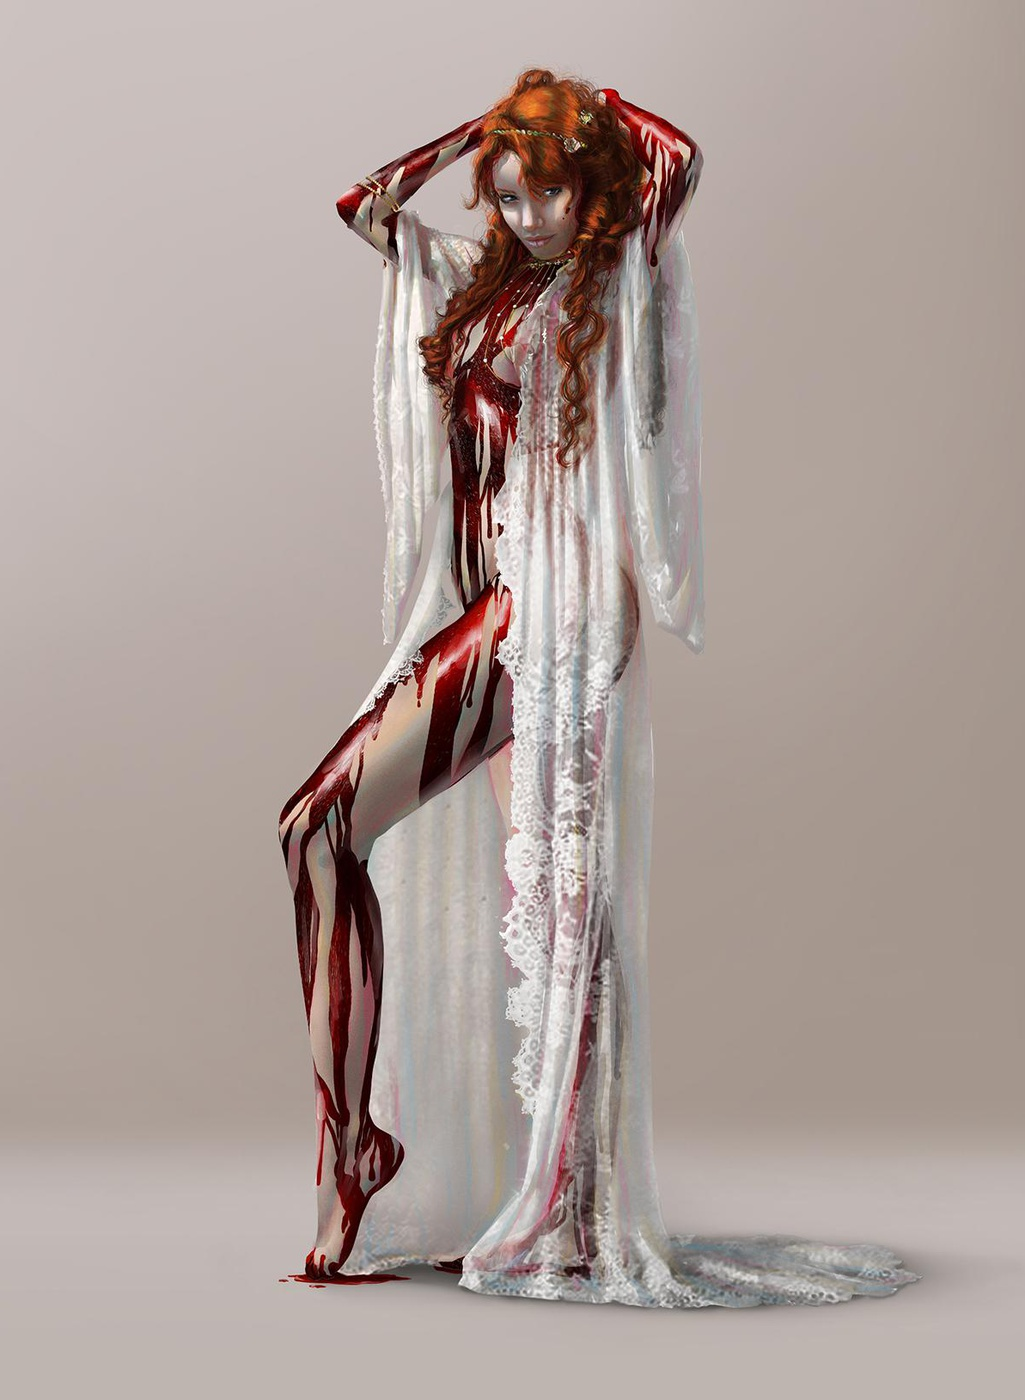 woman bleeding in white clothing